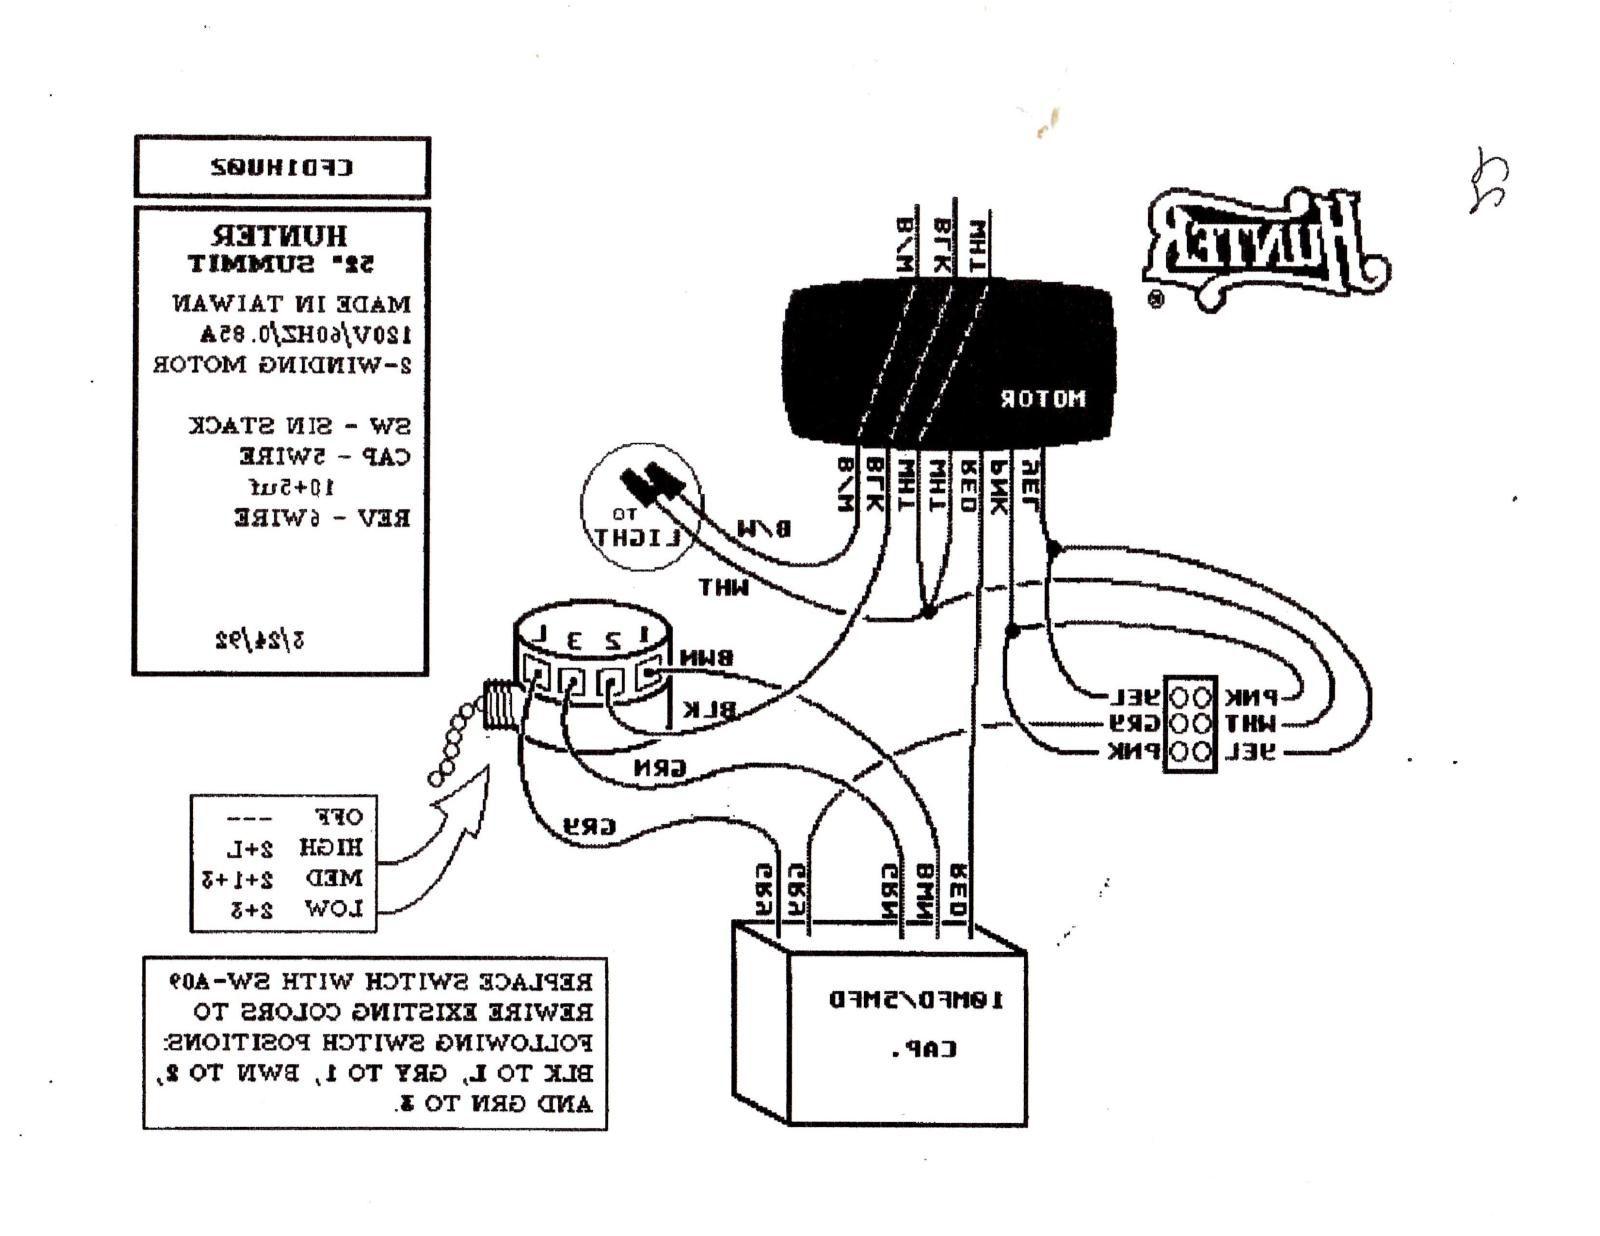 fan light kit wiring diagram ronk phase converter hunter ceiling instructions